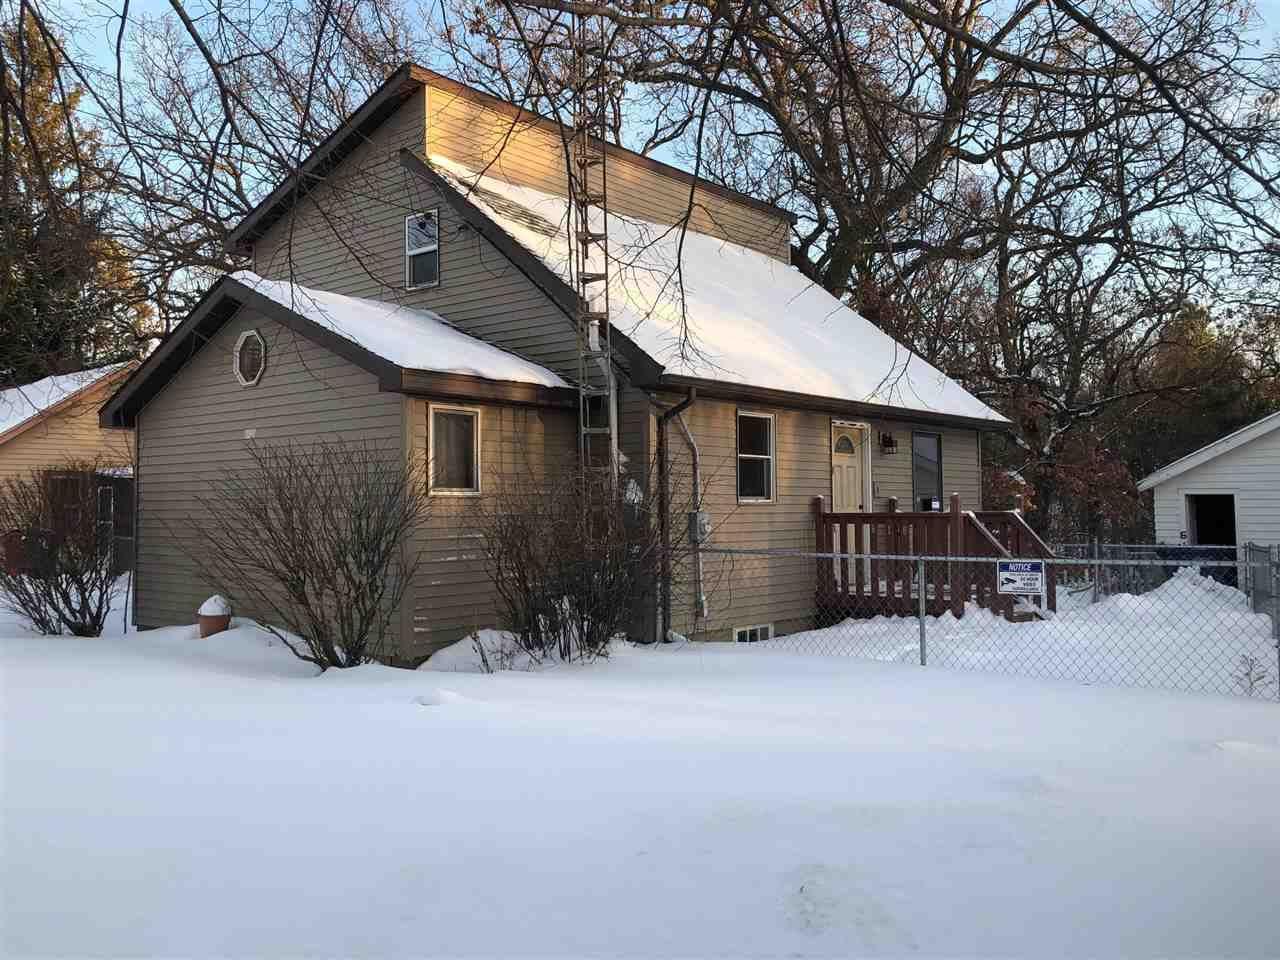 616 E Cranston Rd, Beloit, WI 53511 - #: 1901181